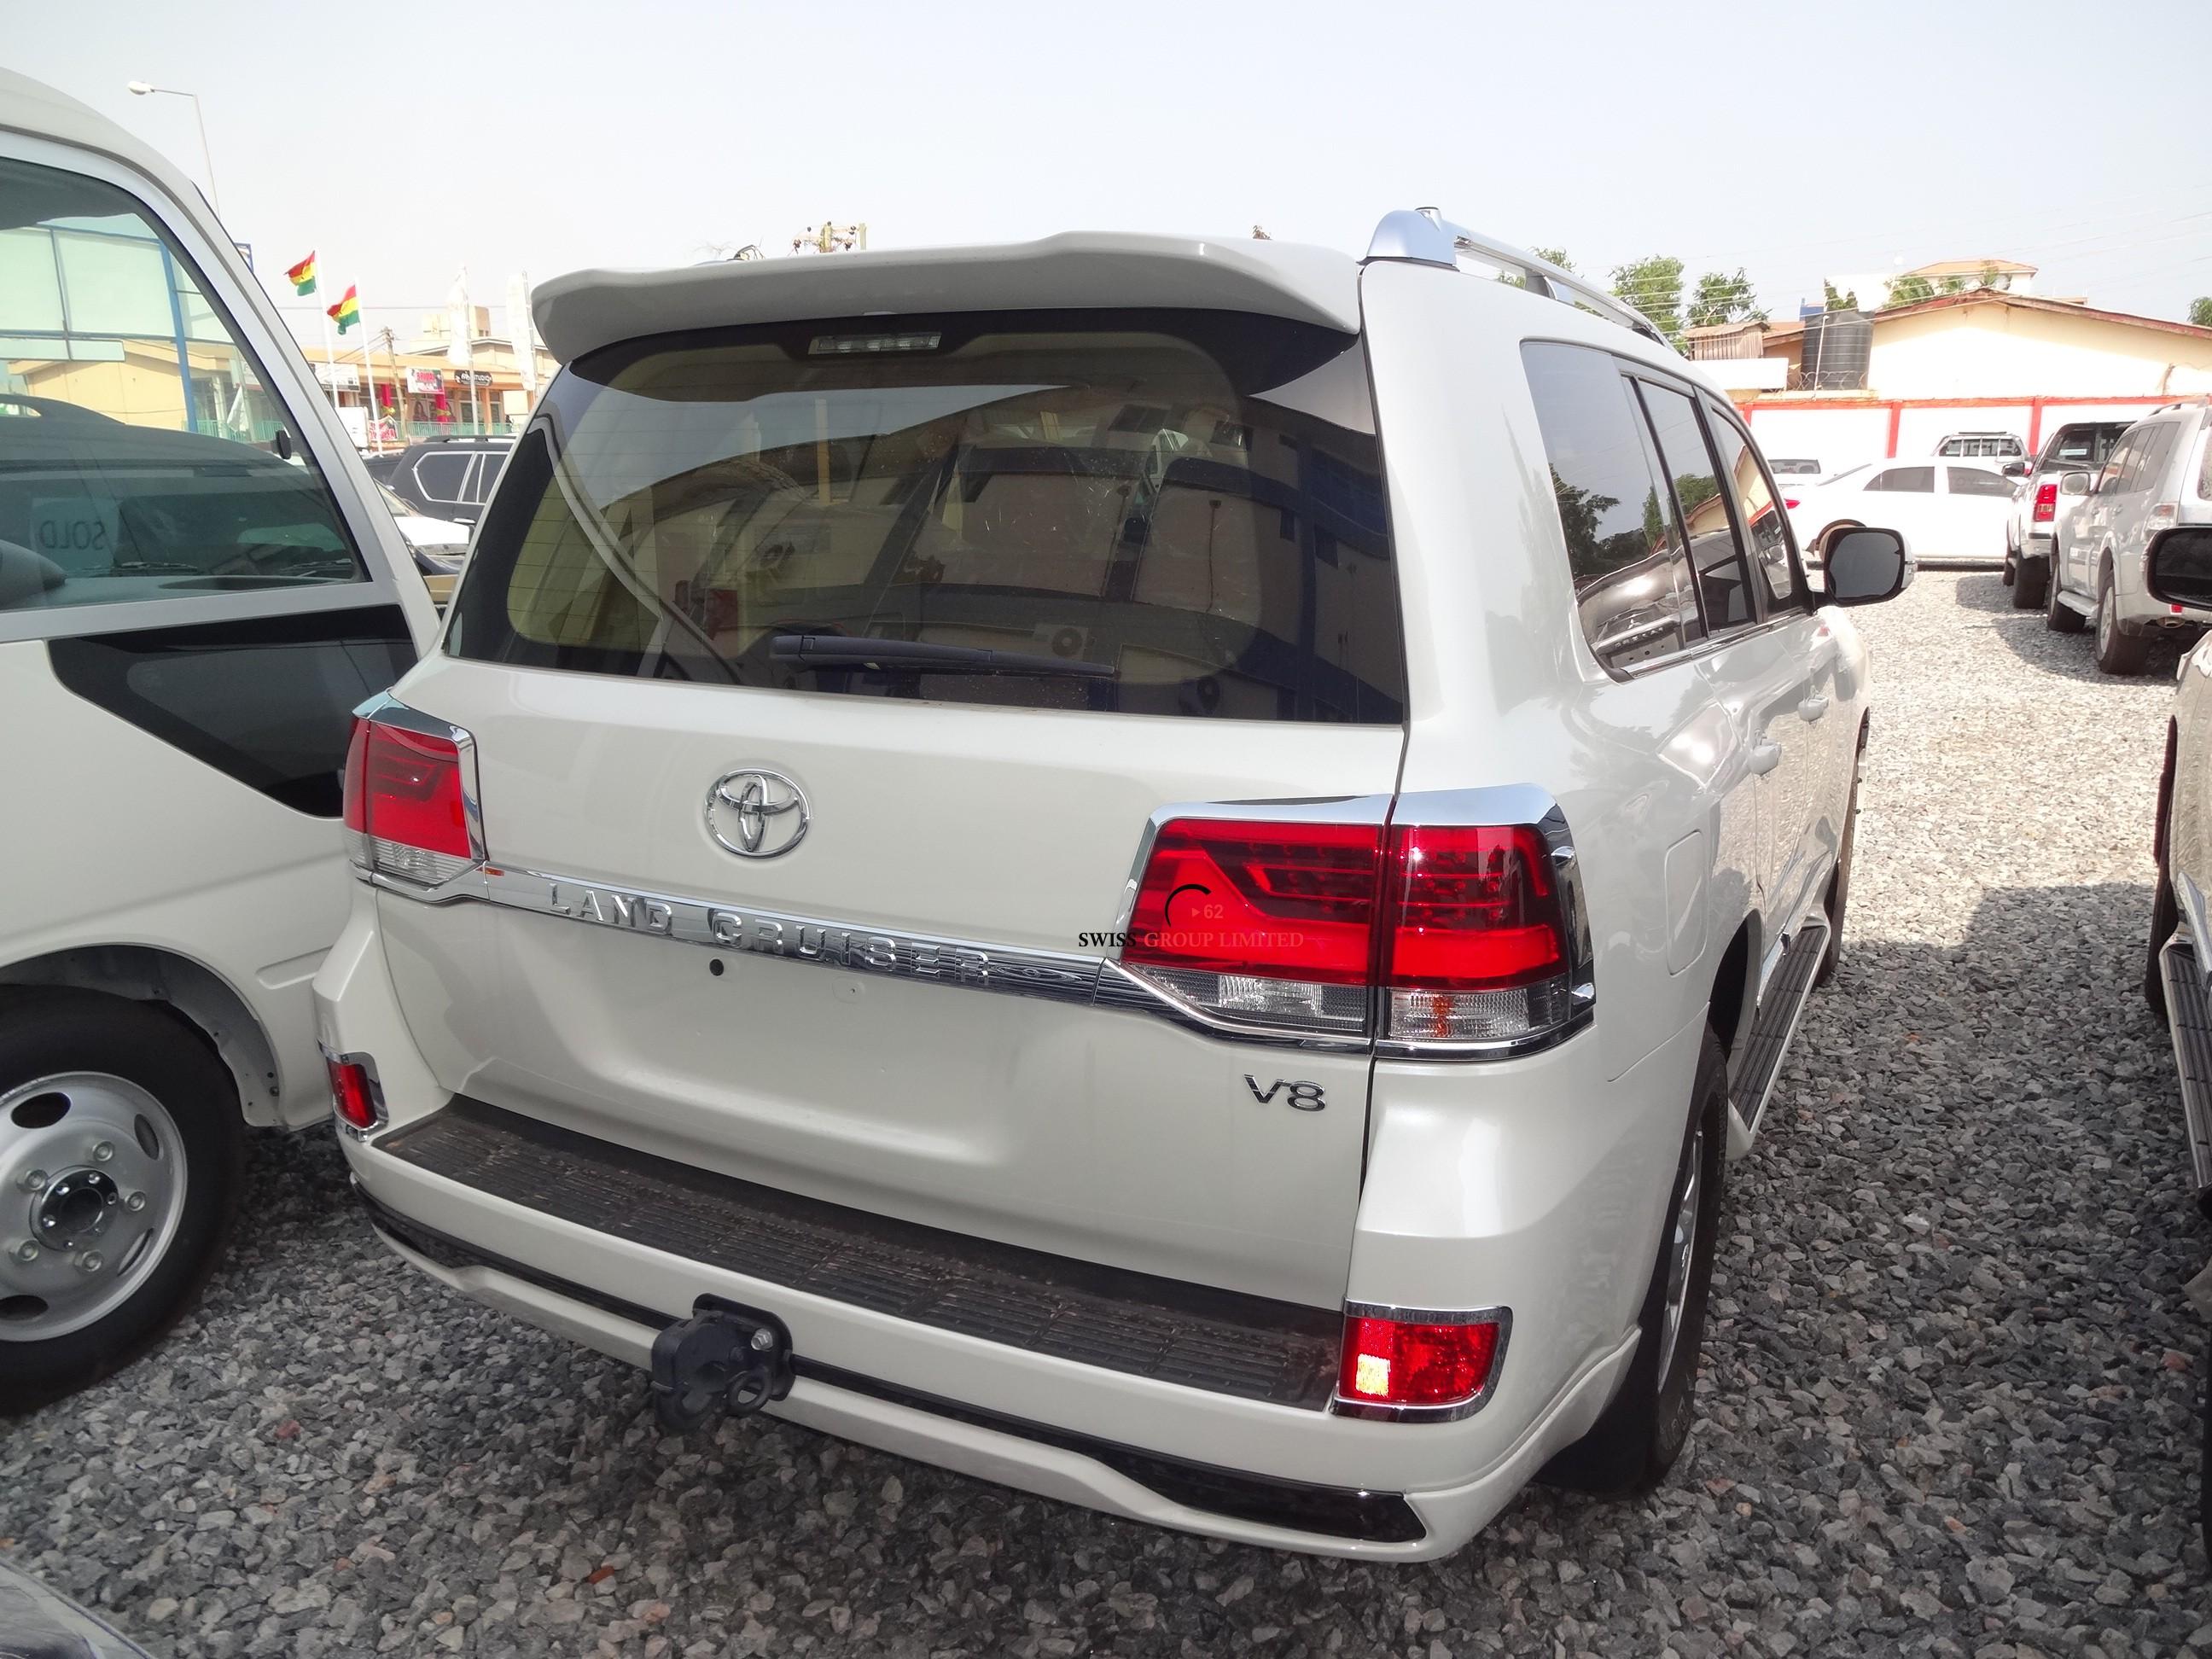 Toyota Land Cruiser Diesel >> Toyota Land Cruiser V8 White – Swiss Group Limited